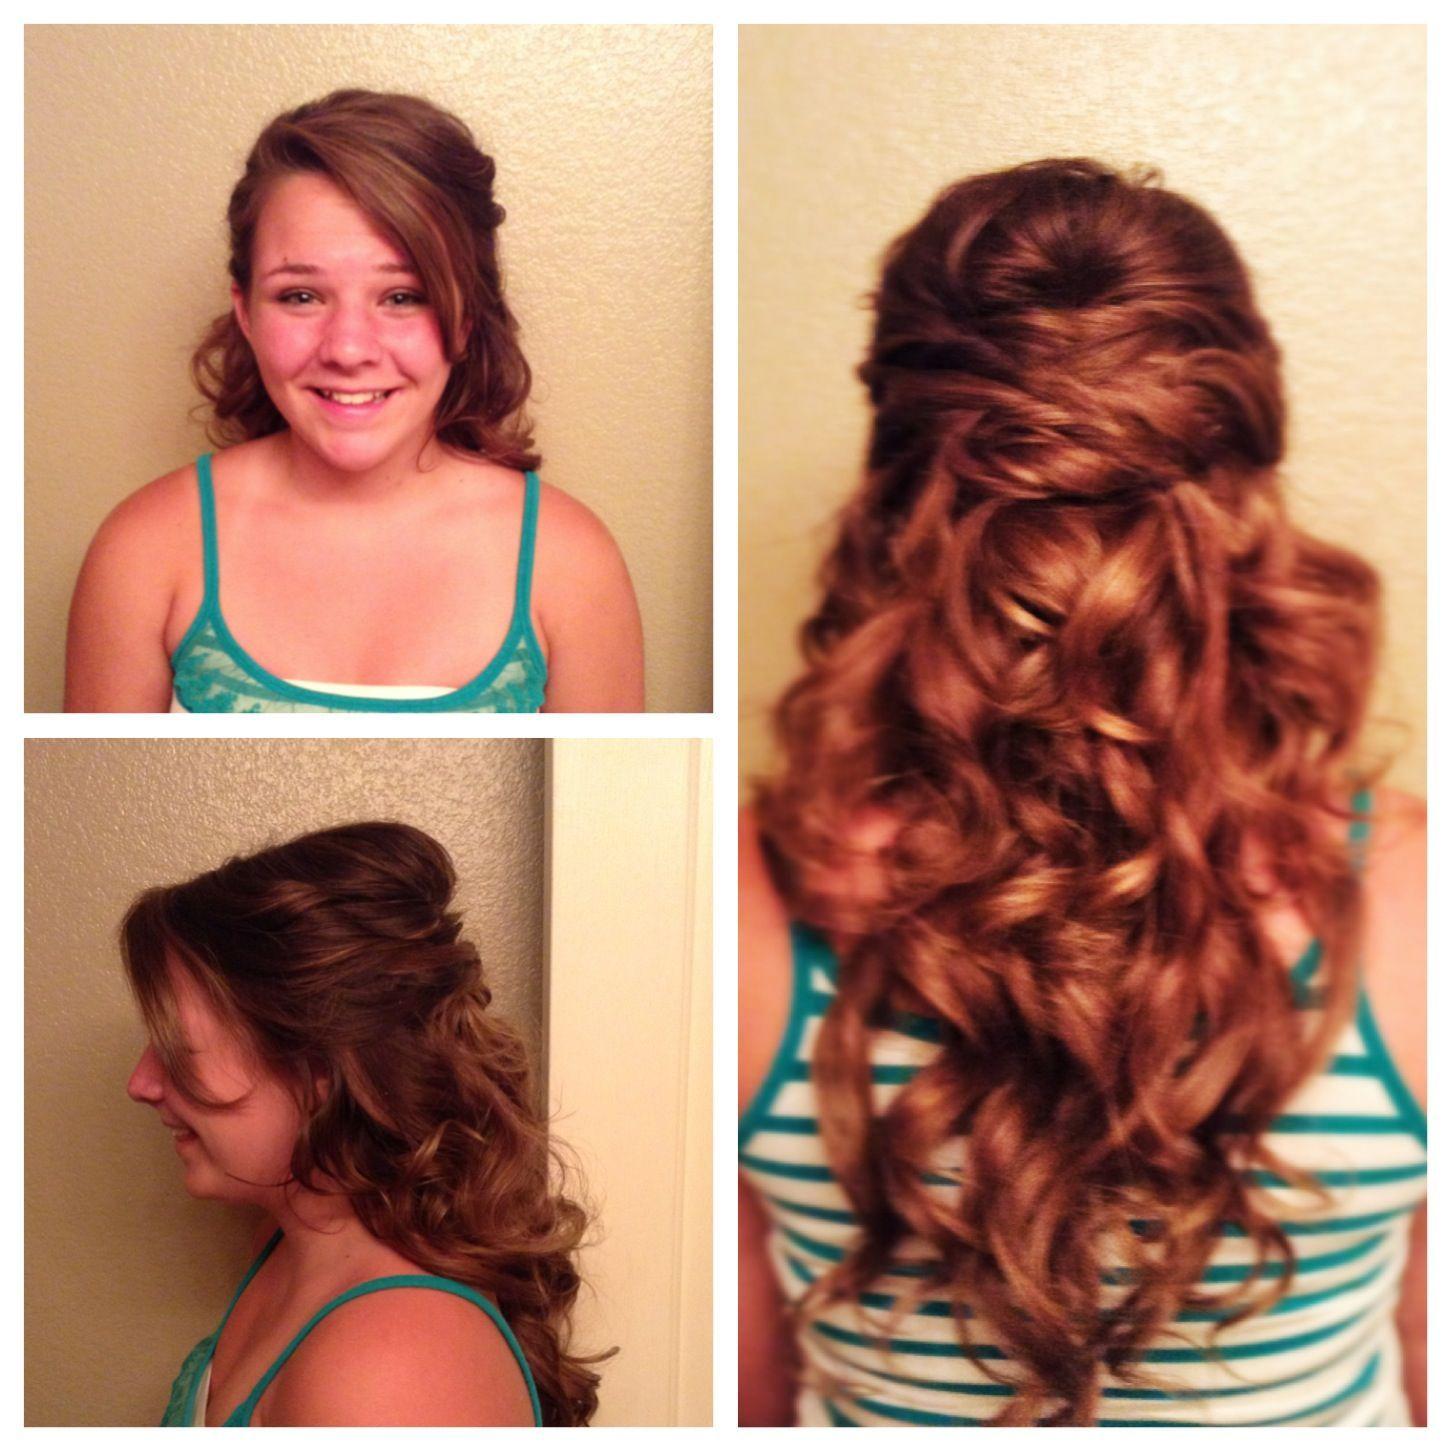 Wwv Hairstylestrends Me Graduation Hairstyles Short Hair Styles Hair Styles